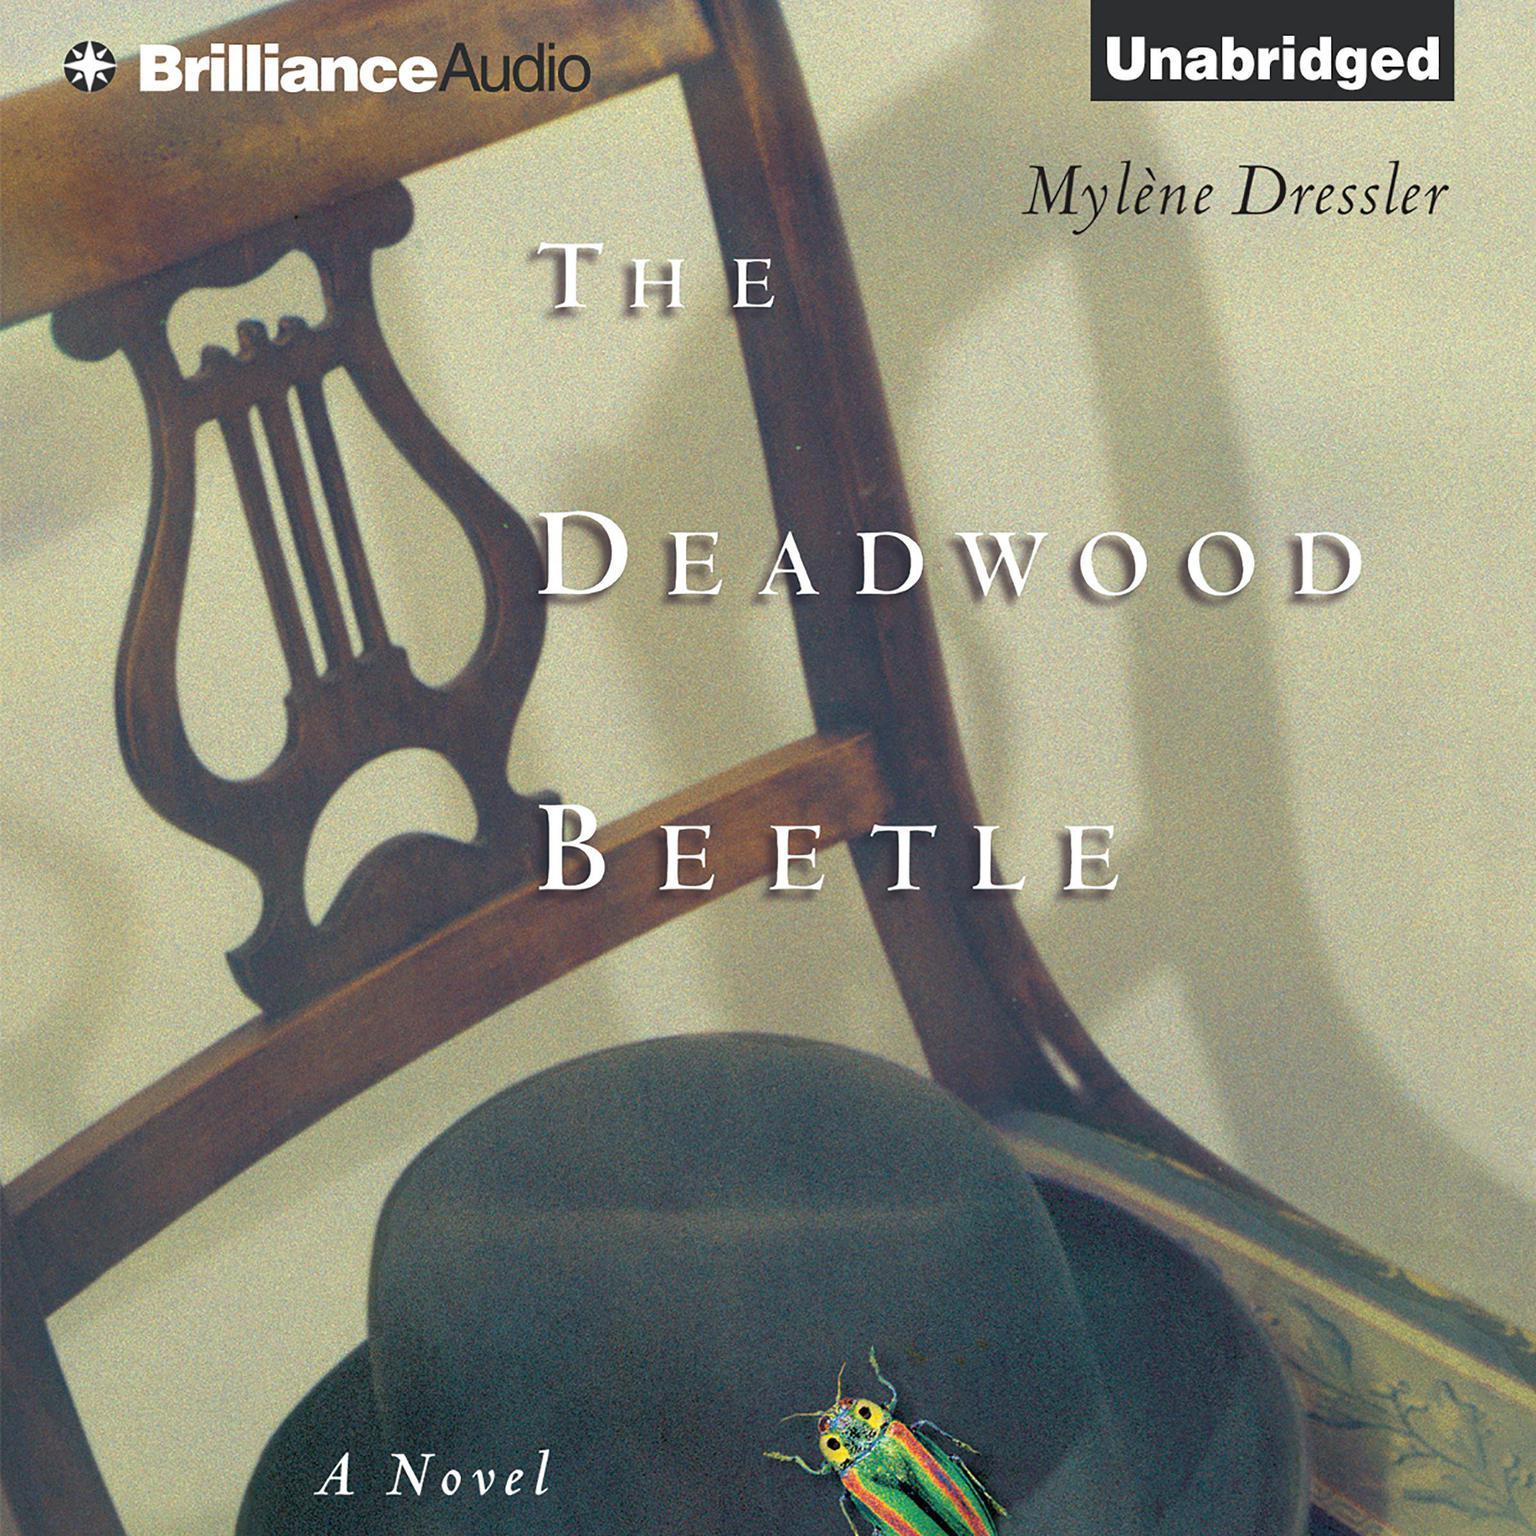 Printable The Deadwood Beetle: A Novel Audiobook Cover Art